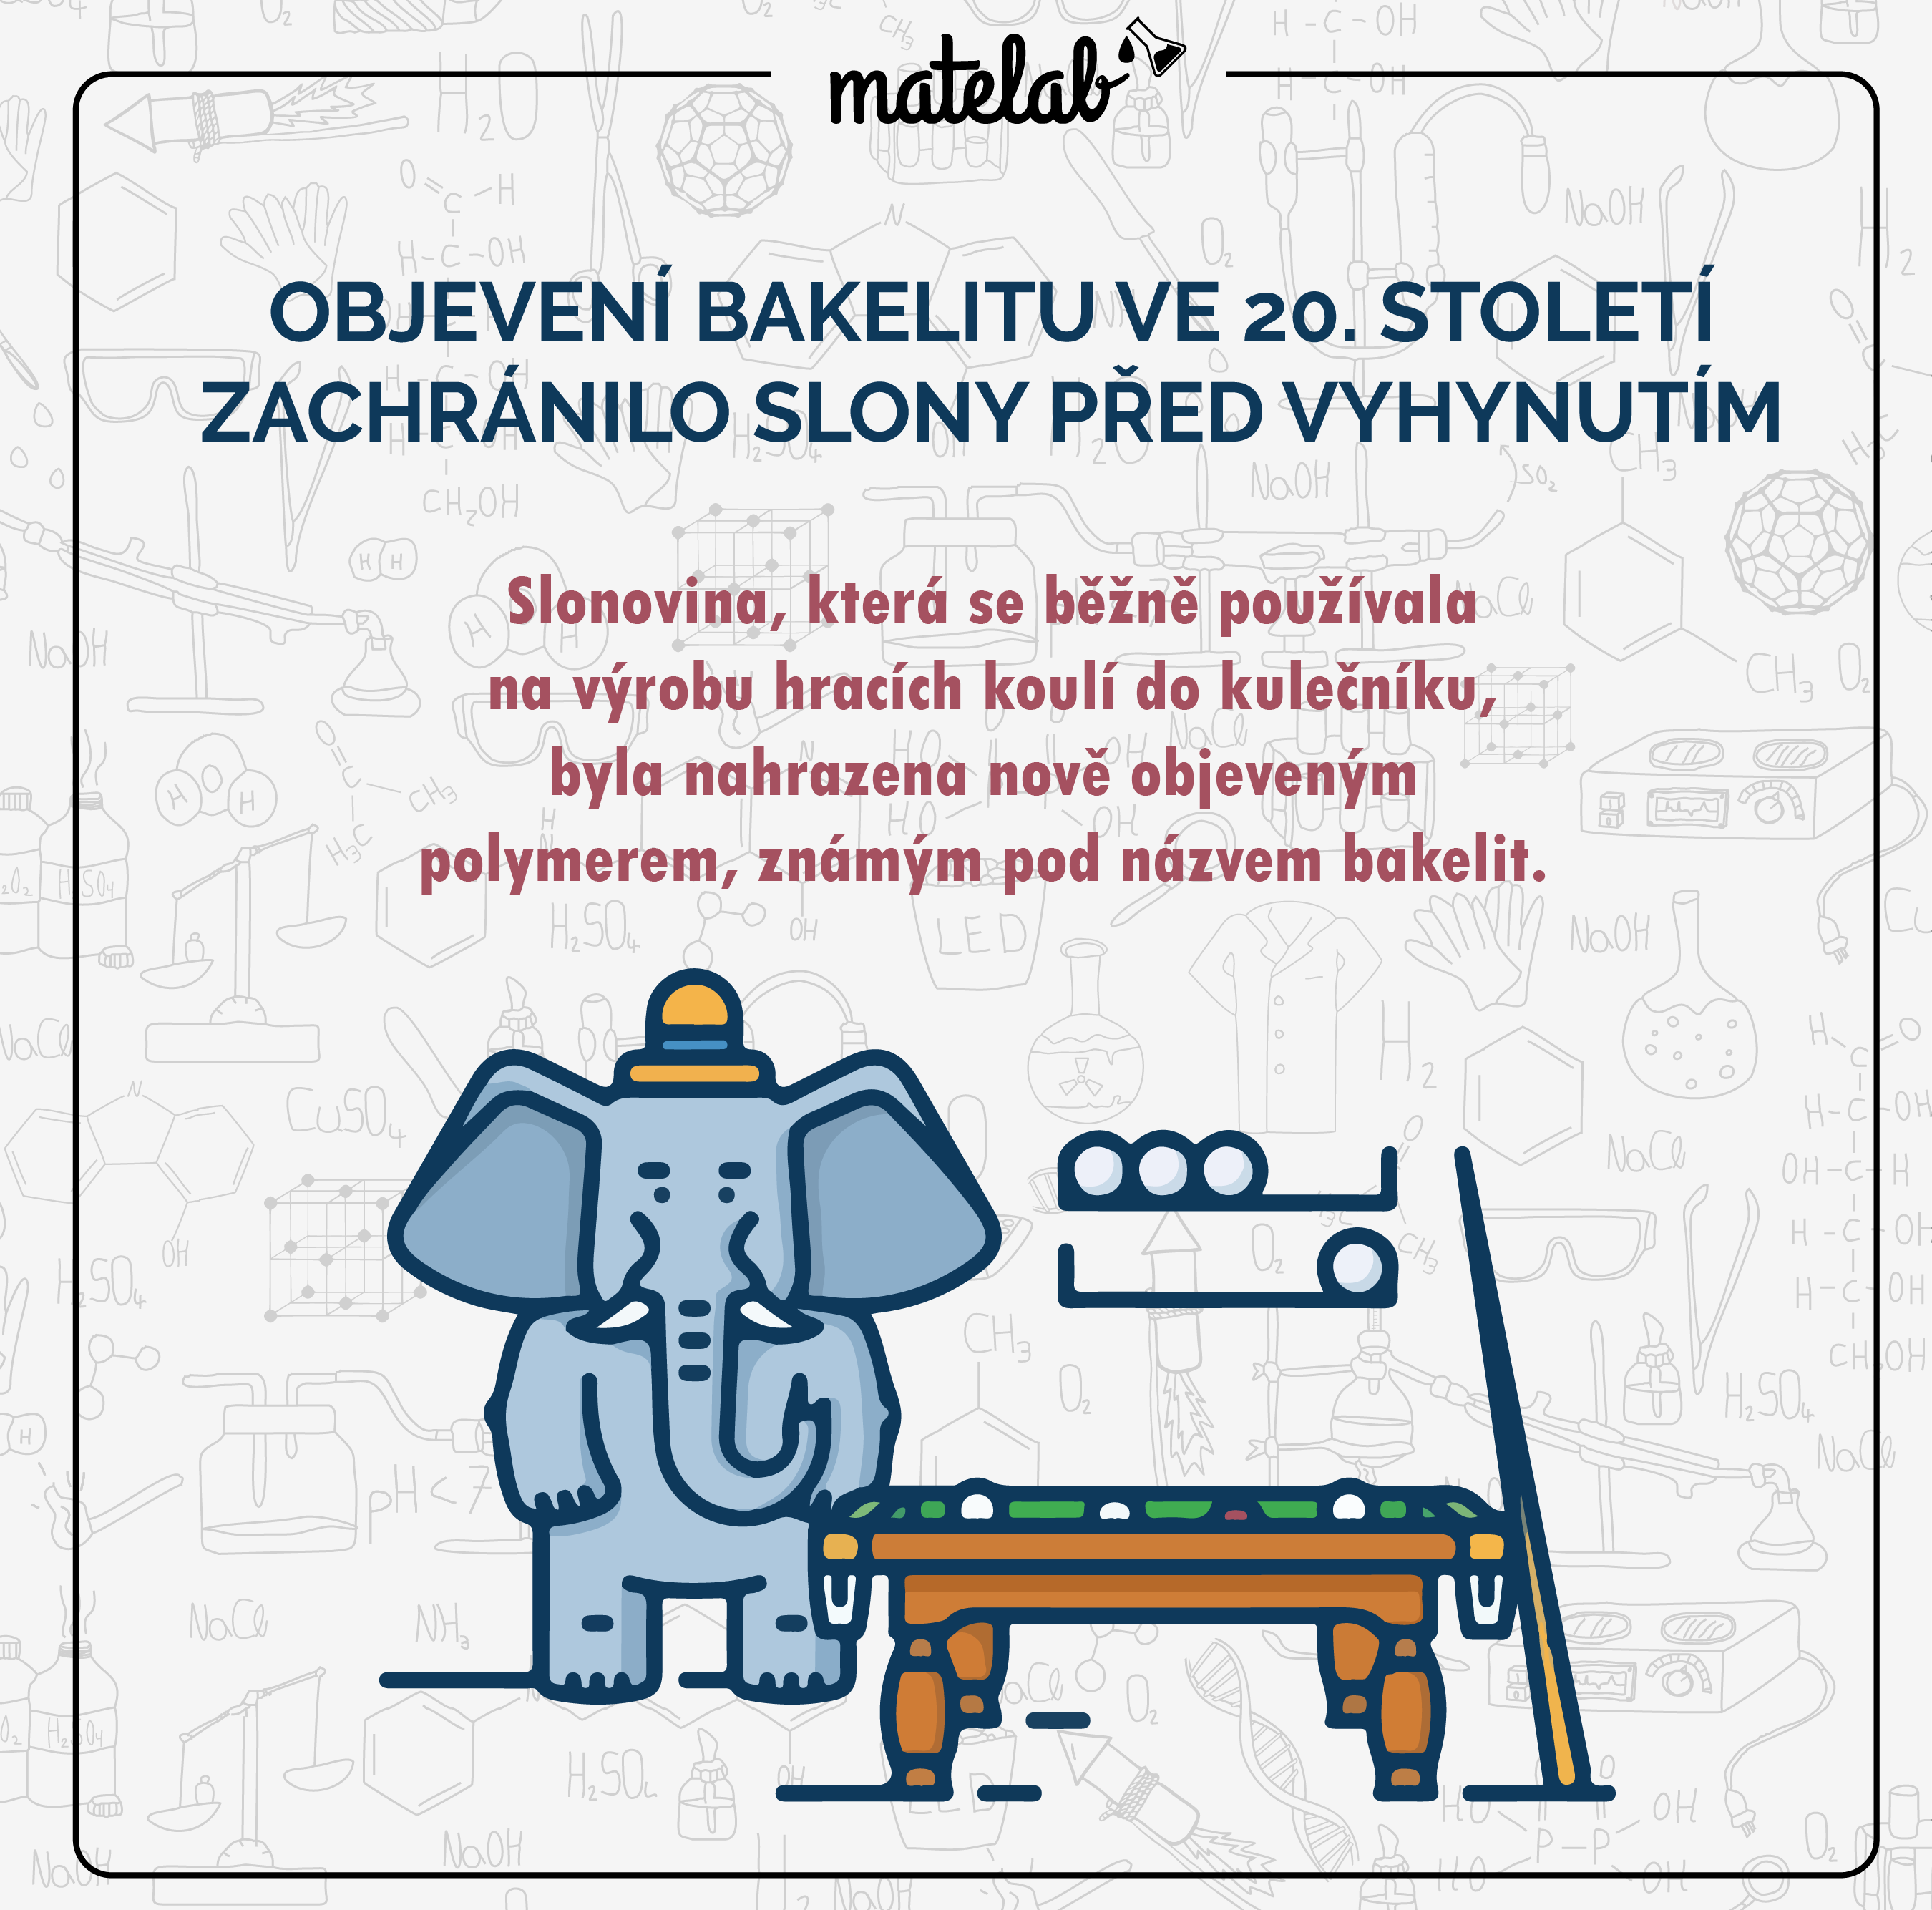 Bakelit zachraňuje slony